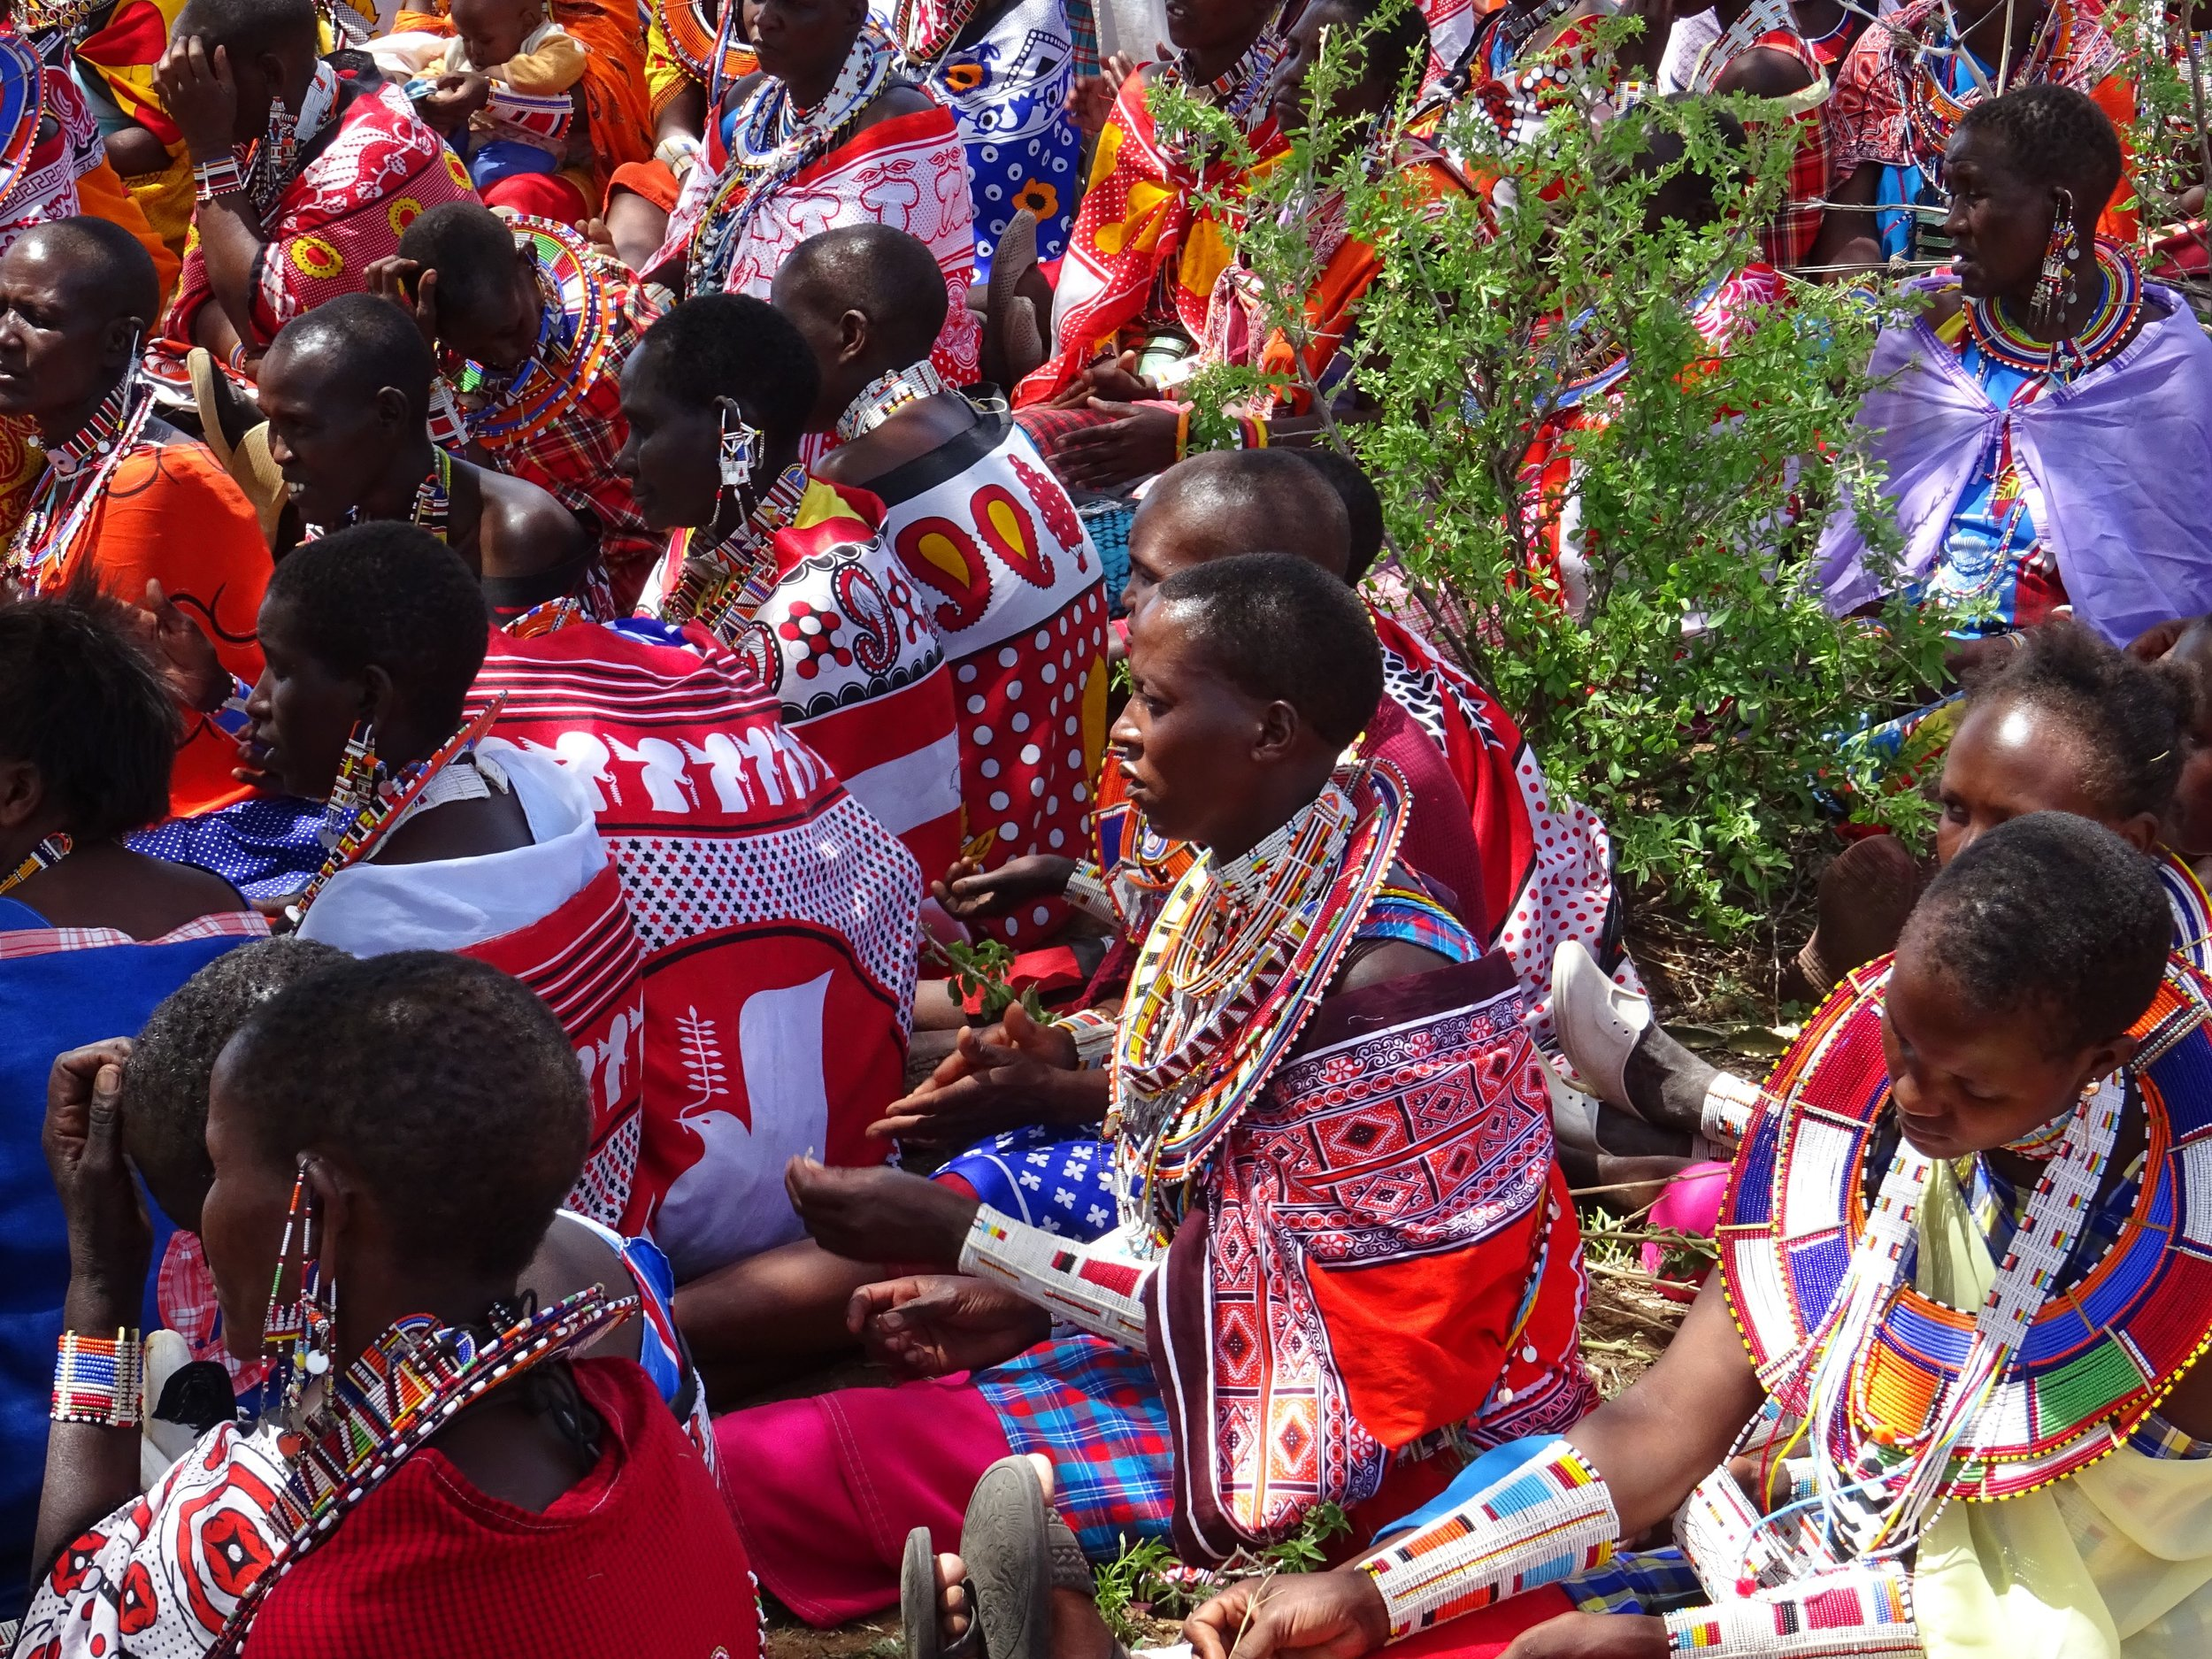 Maasai-women-collect-wate-007.jpg